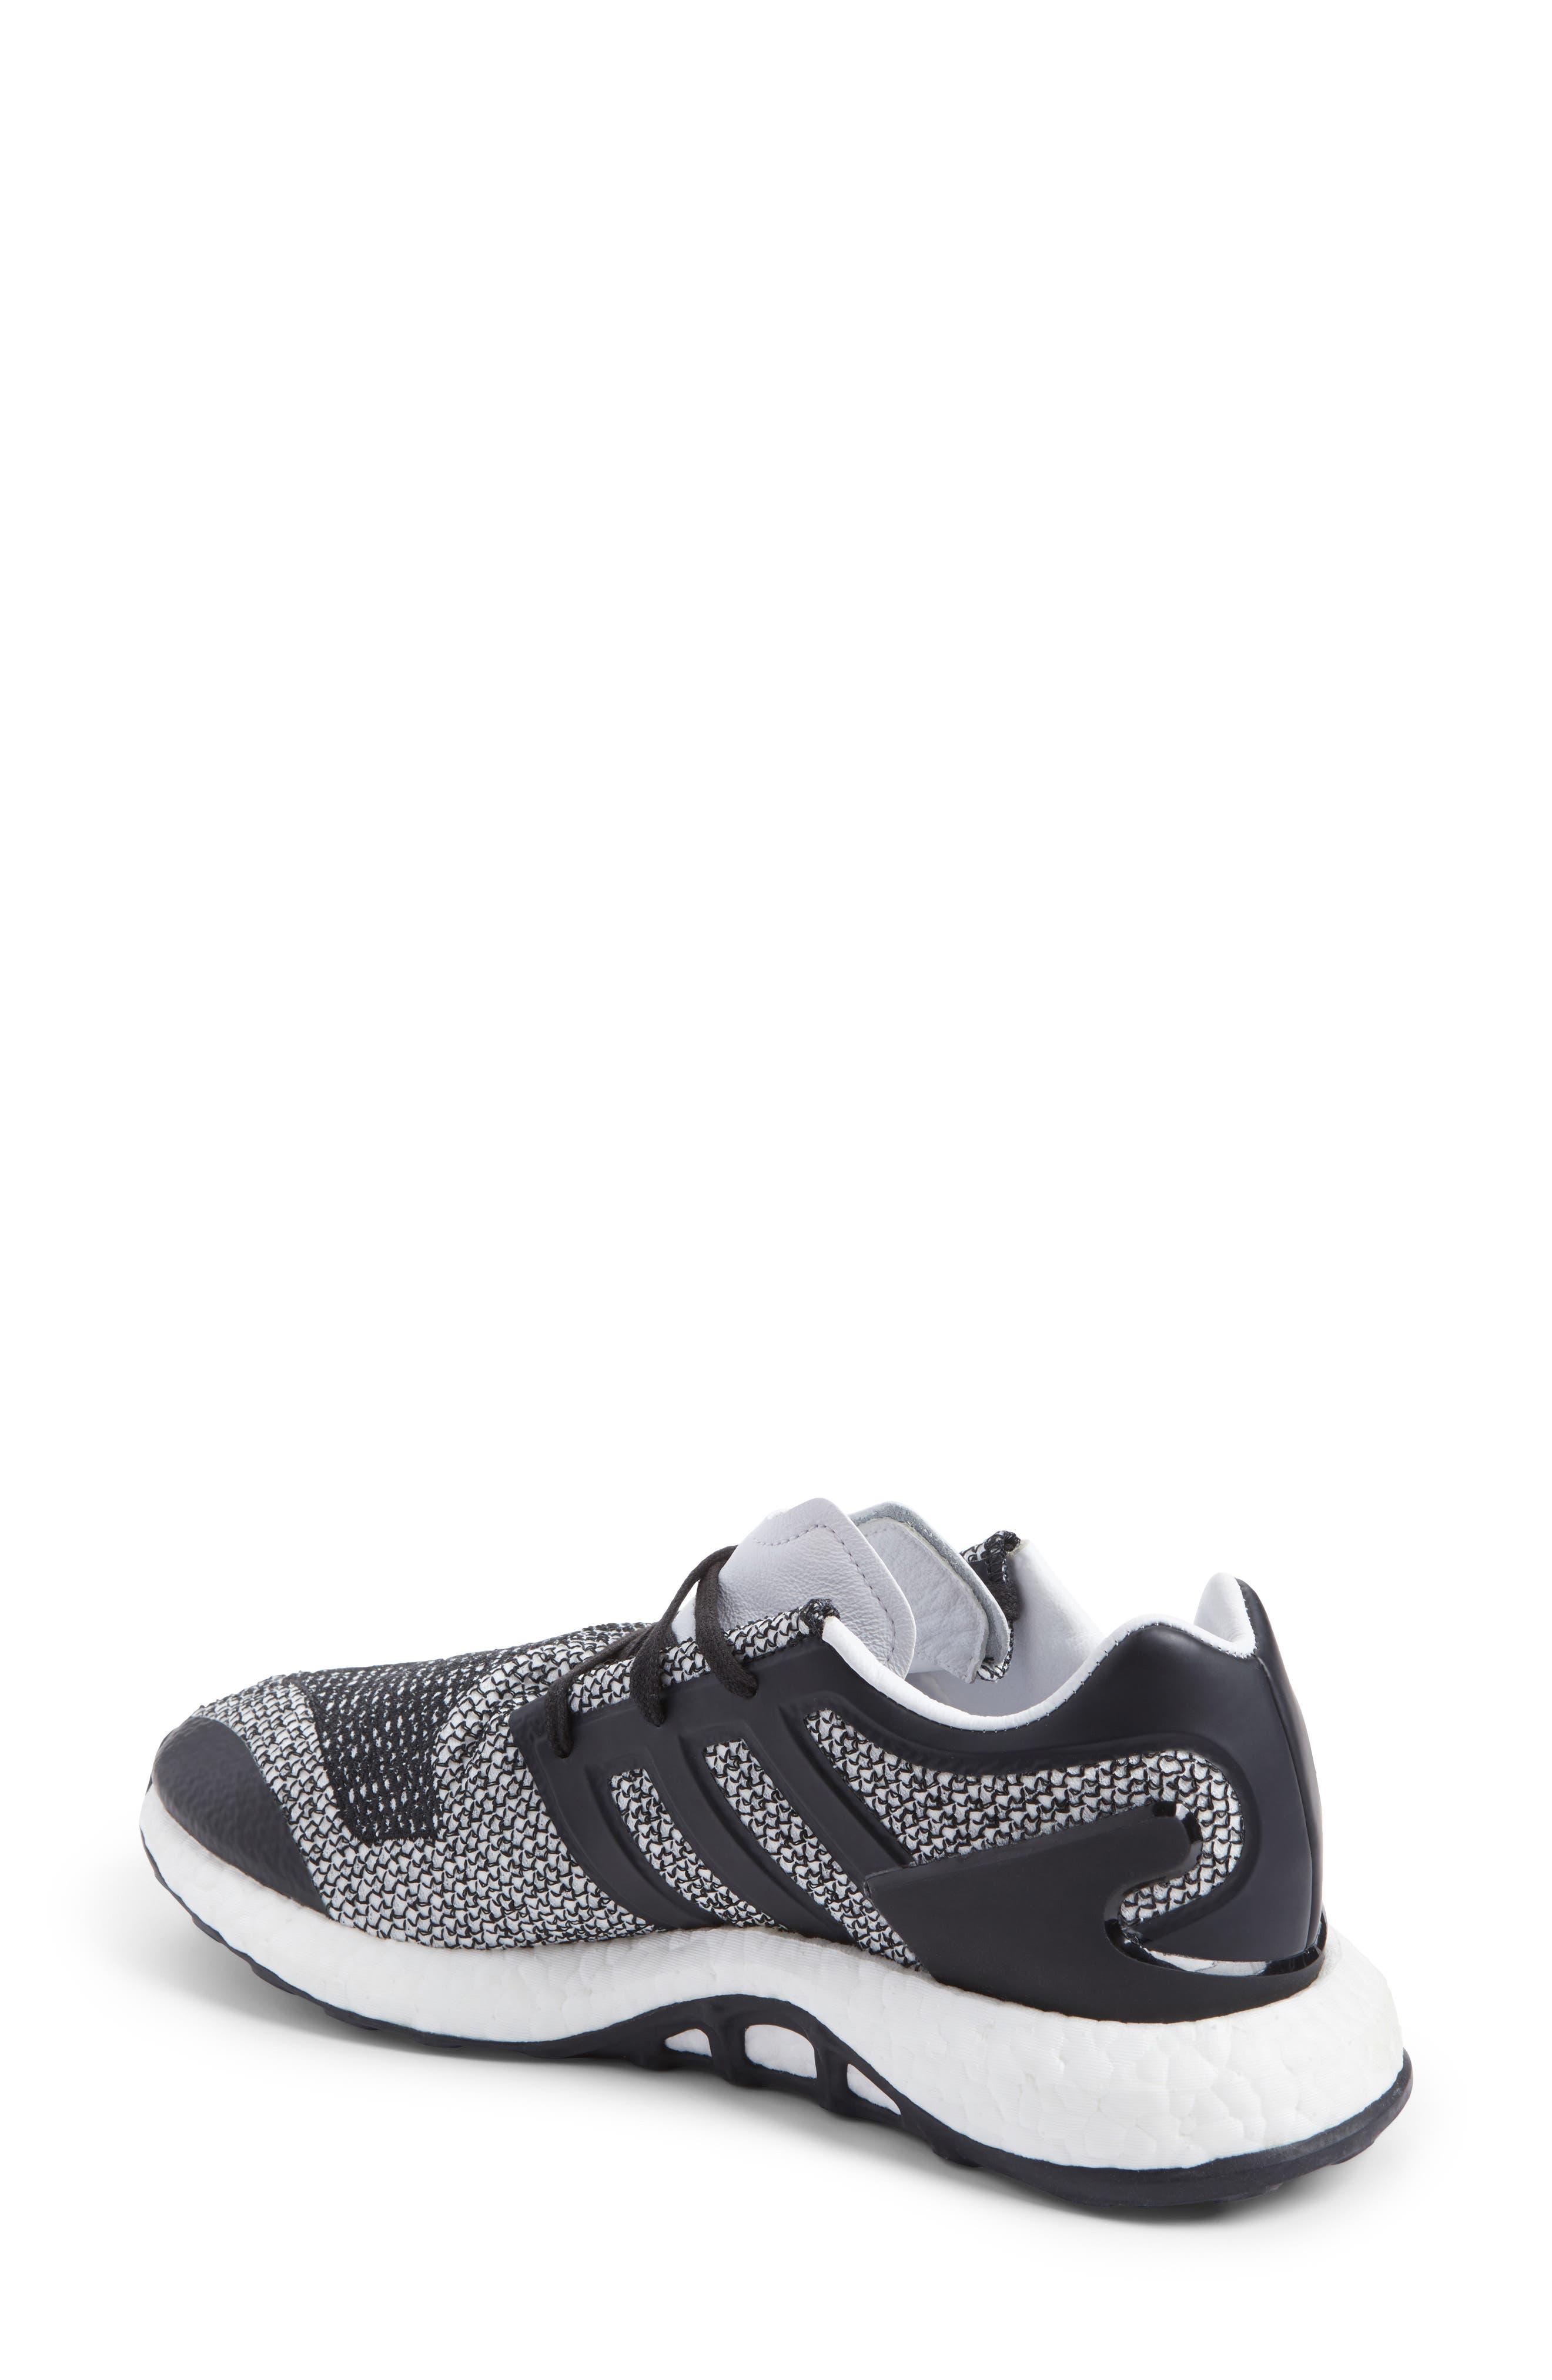 PureBoost Sneaker,                             Alternate thumbnail 2, color,                             White/ Core Black